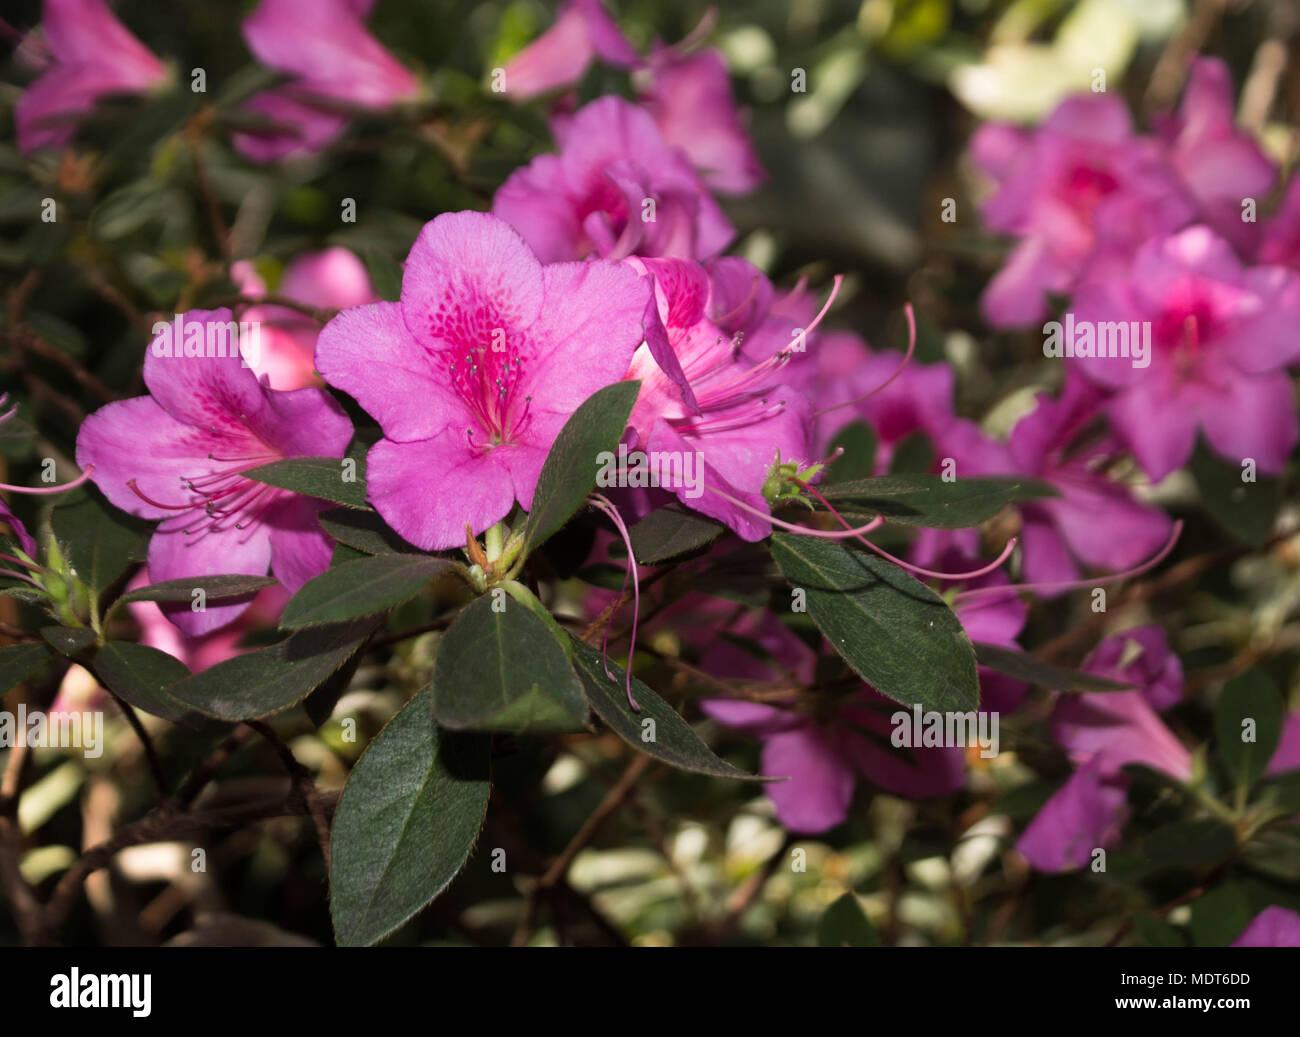 Big pink flowers subtropical plant stock photo 180626137 alamy big pink flowers subtropical plant mightylinksfo